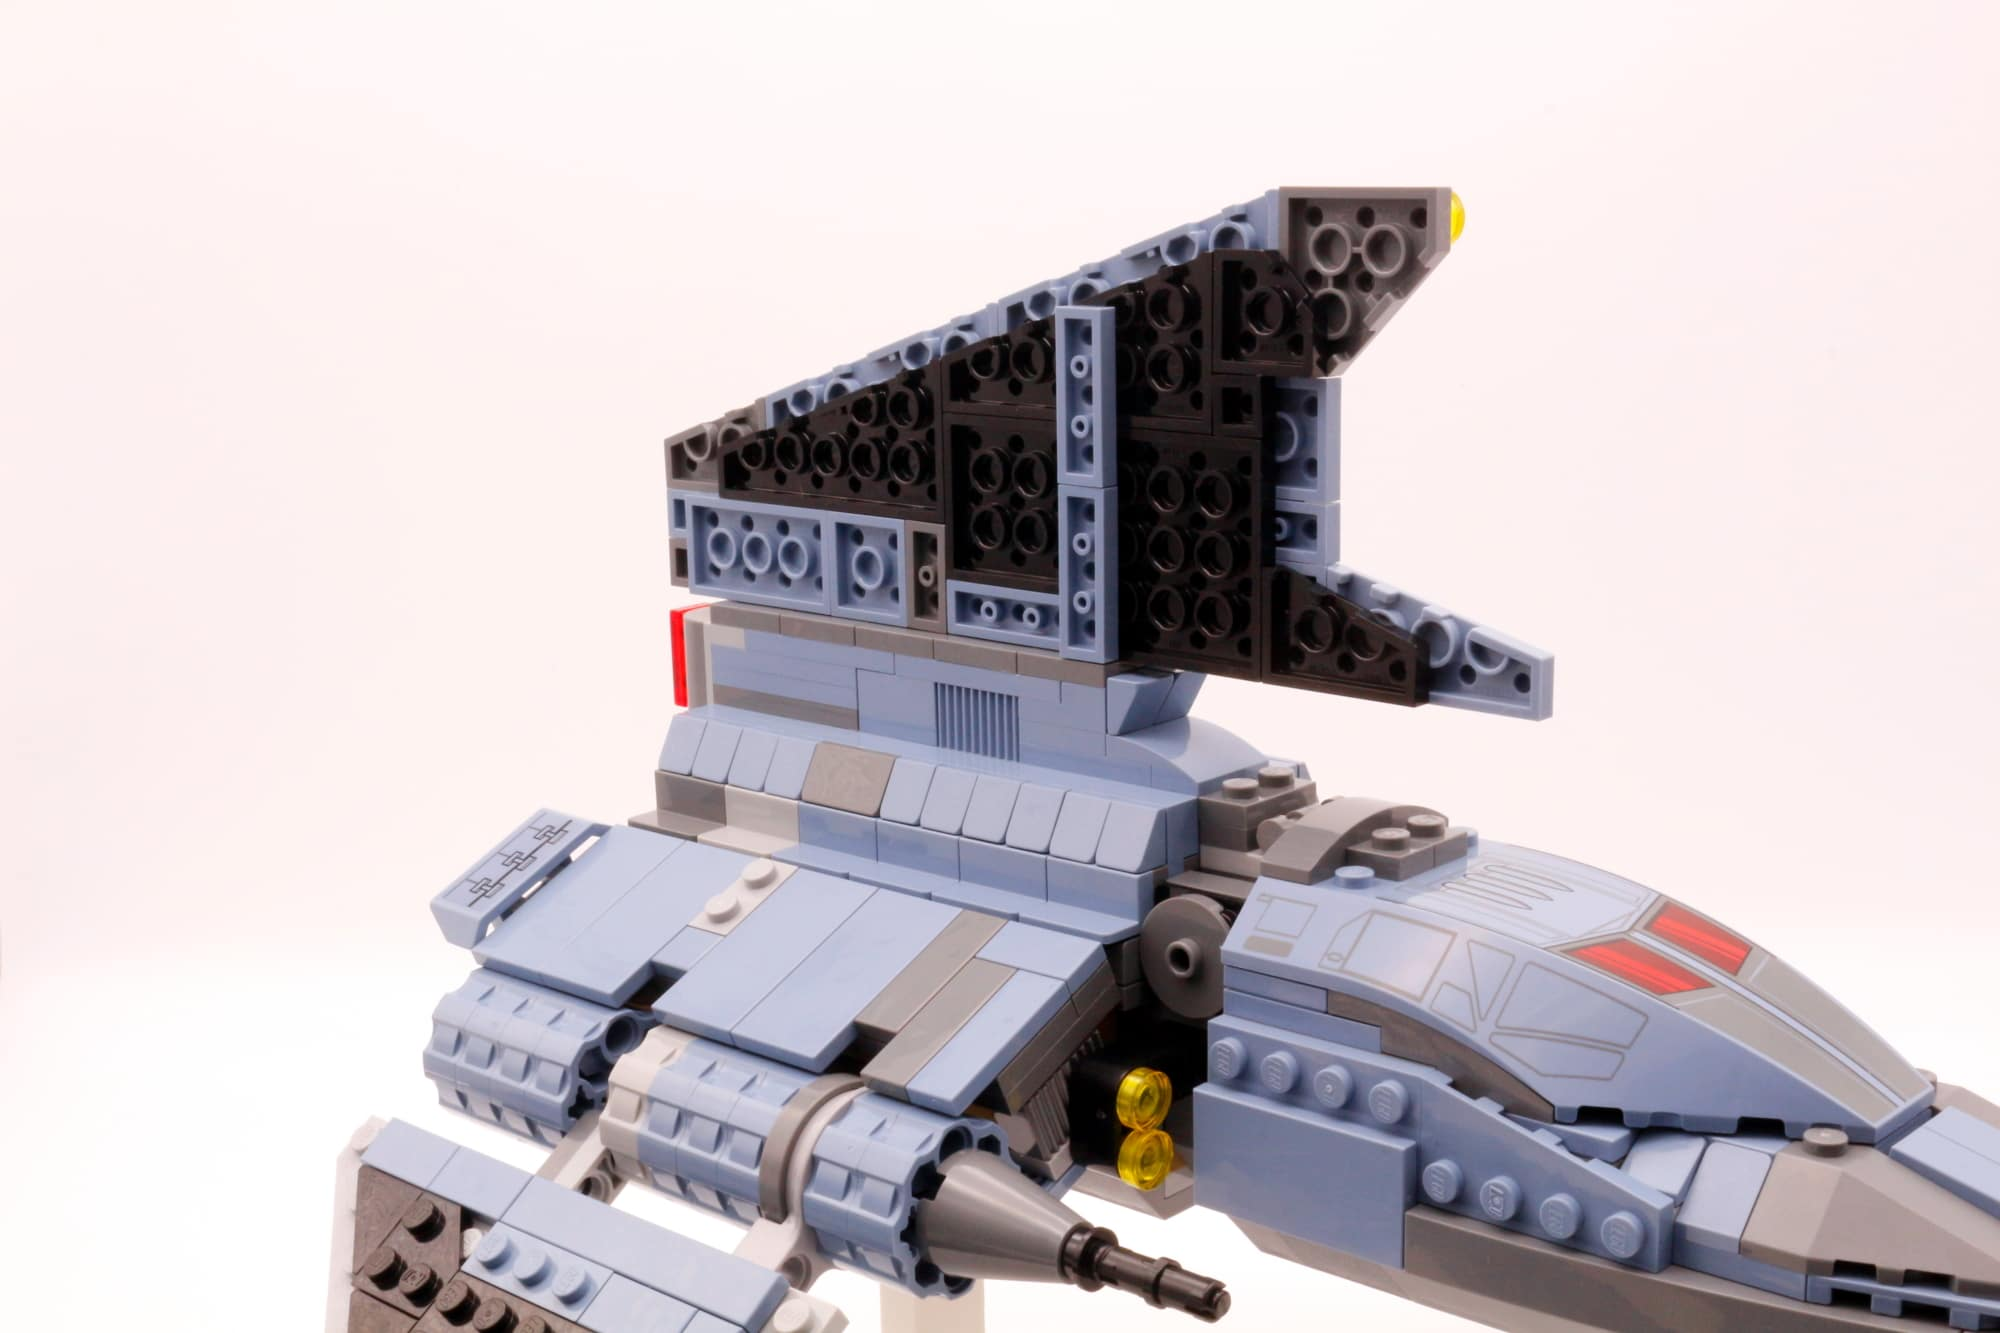 LEGO Star Wars 75314 The Bad Batch Attack Shuttle 17